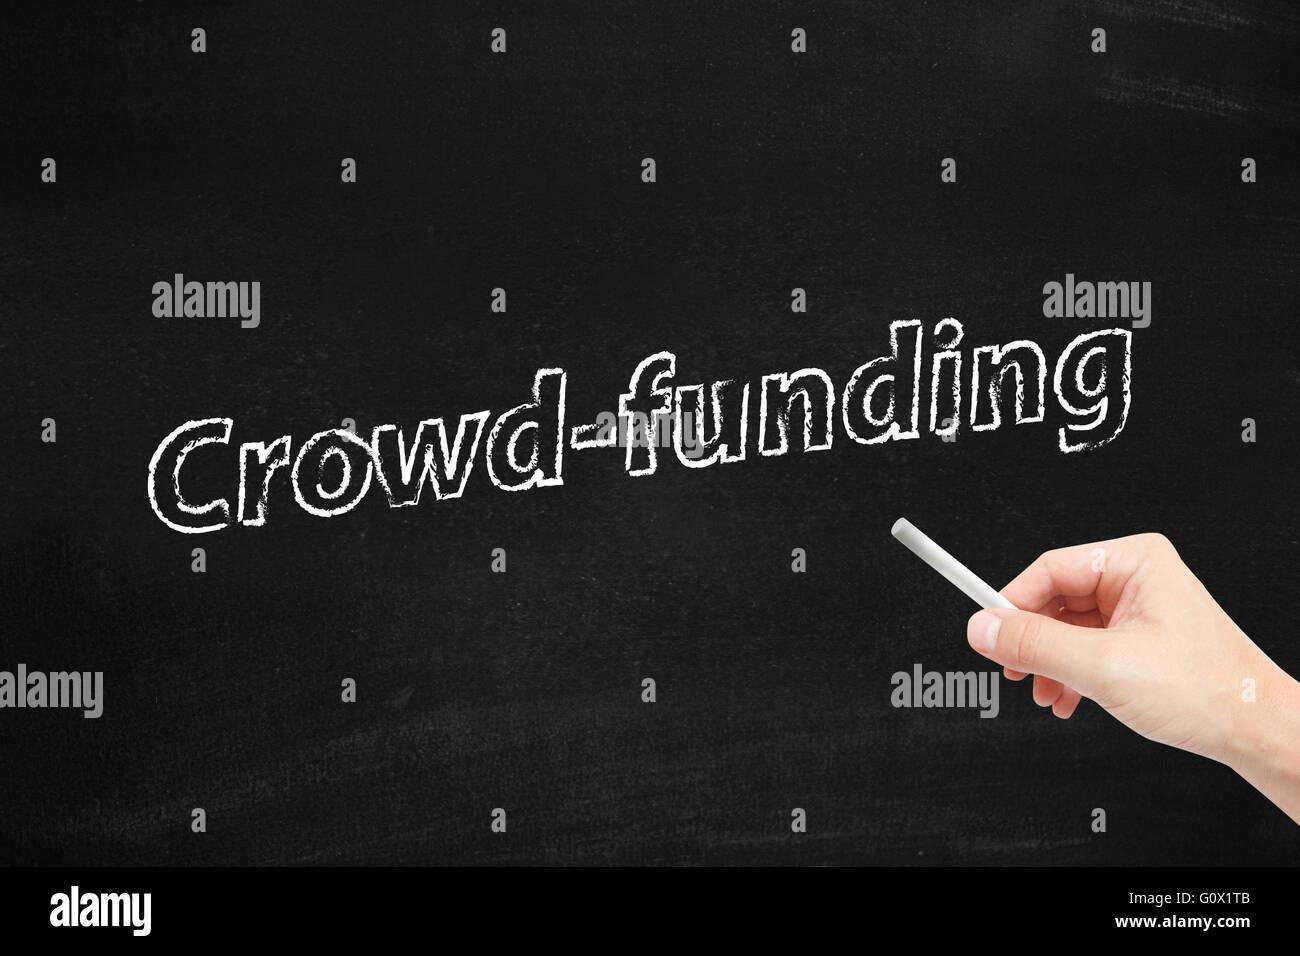 Crowd funding on blackboard - Stock Image